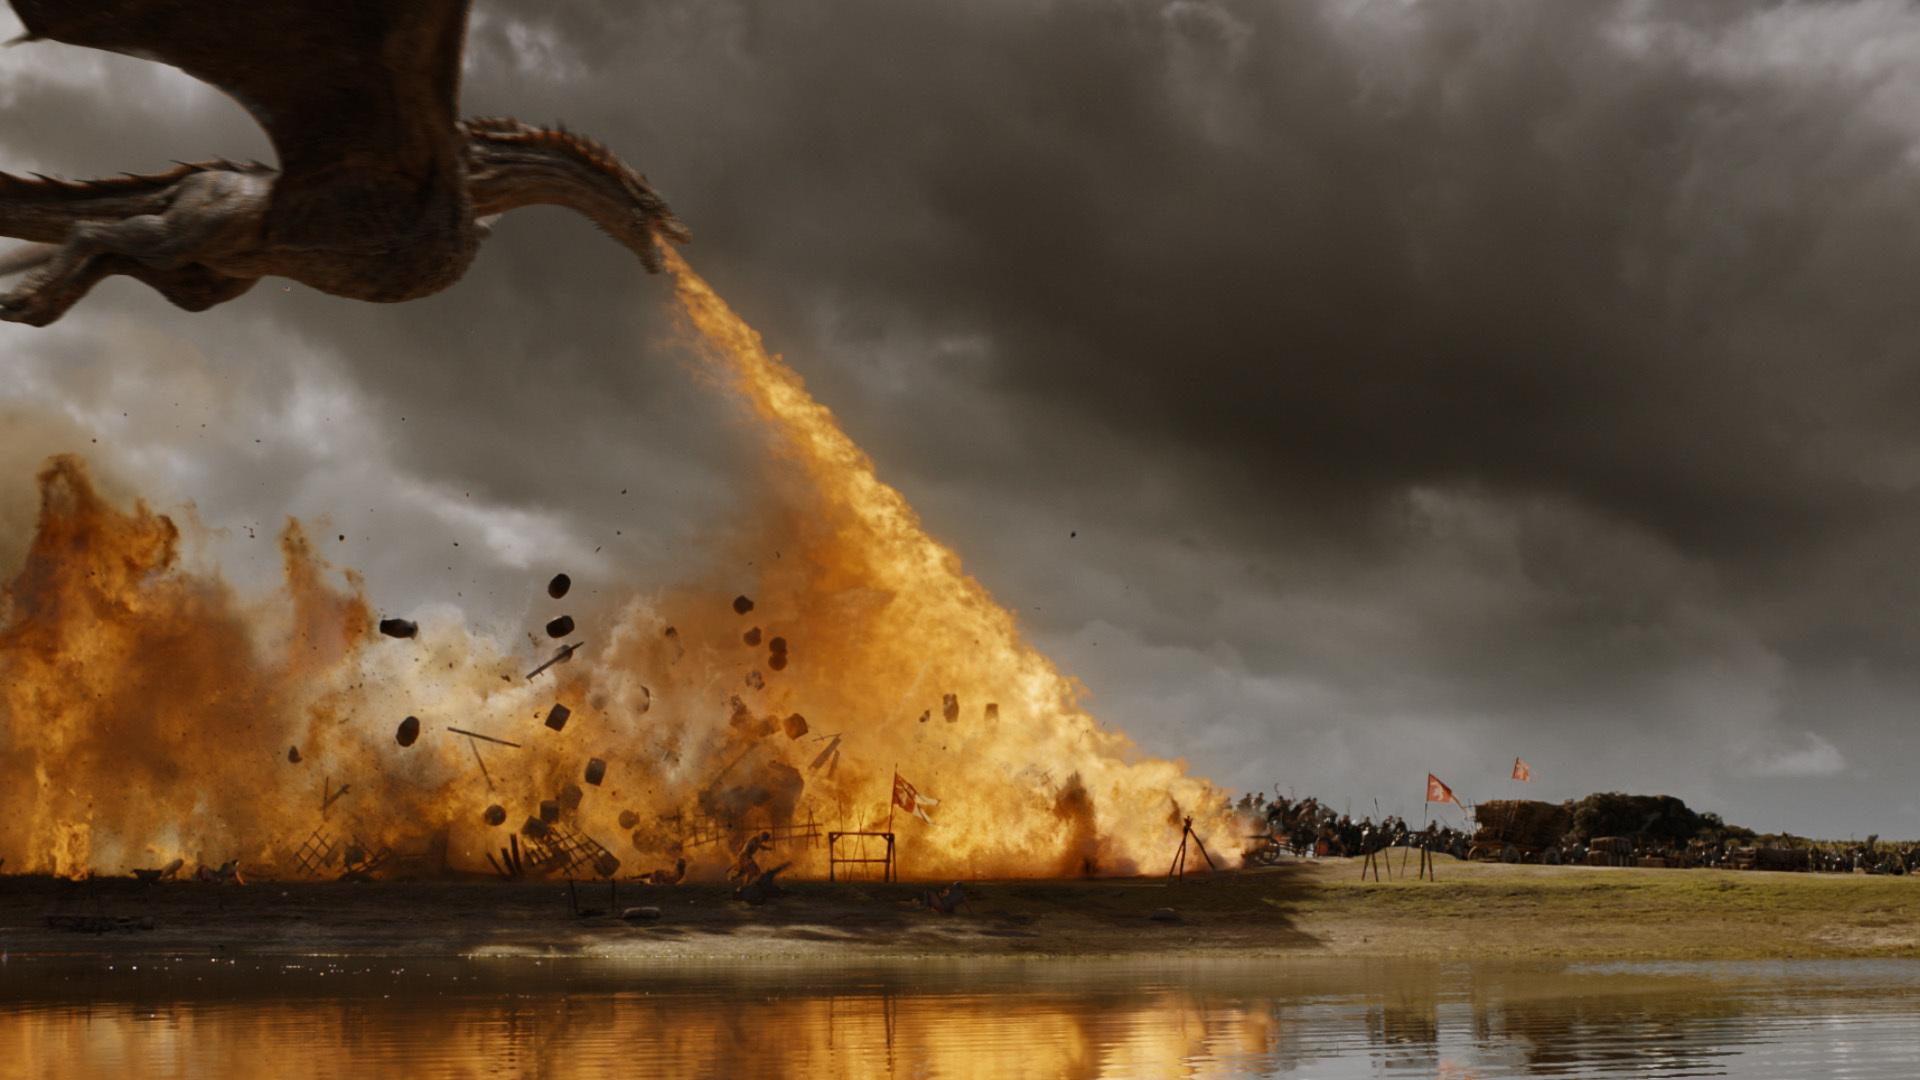 Game Of Thrones Season 7 Dragon Wallpaper Hd - Drogon Game Of Thrones Wallpaper Hd - HD Wallpaper